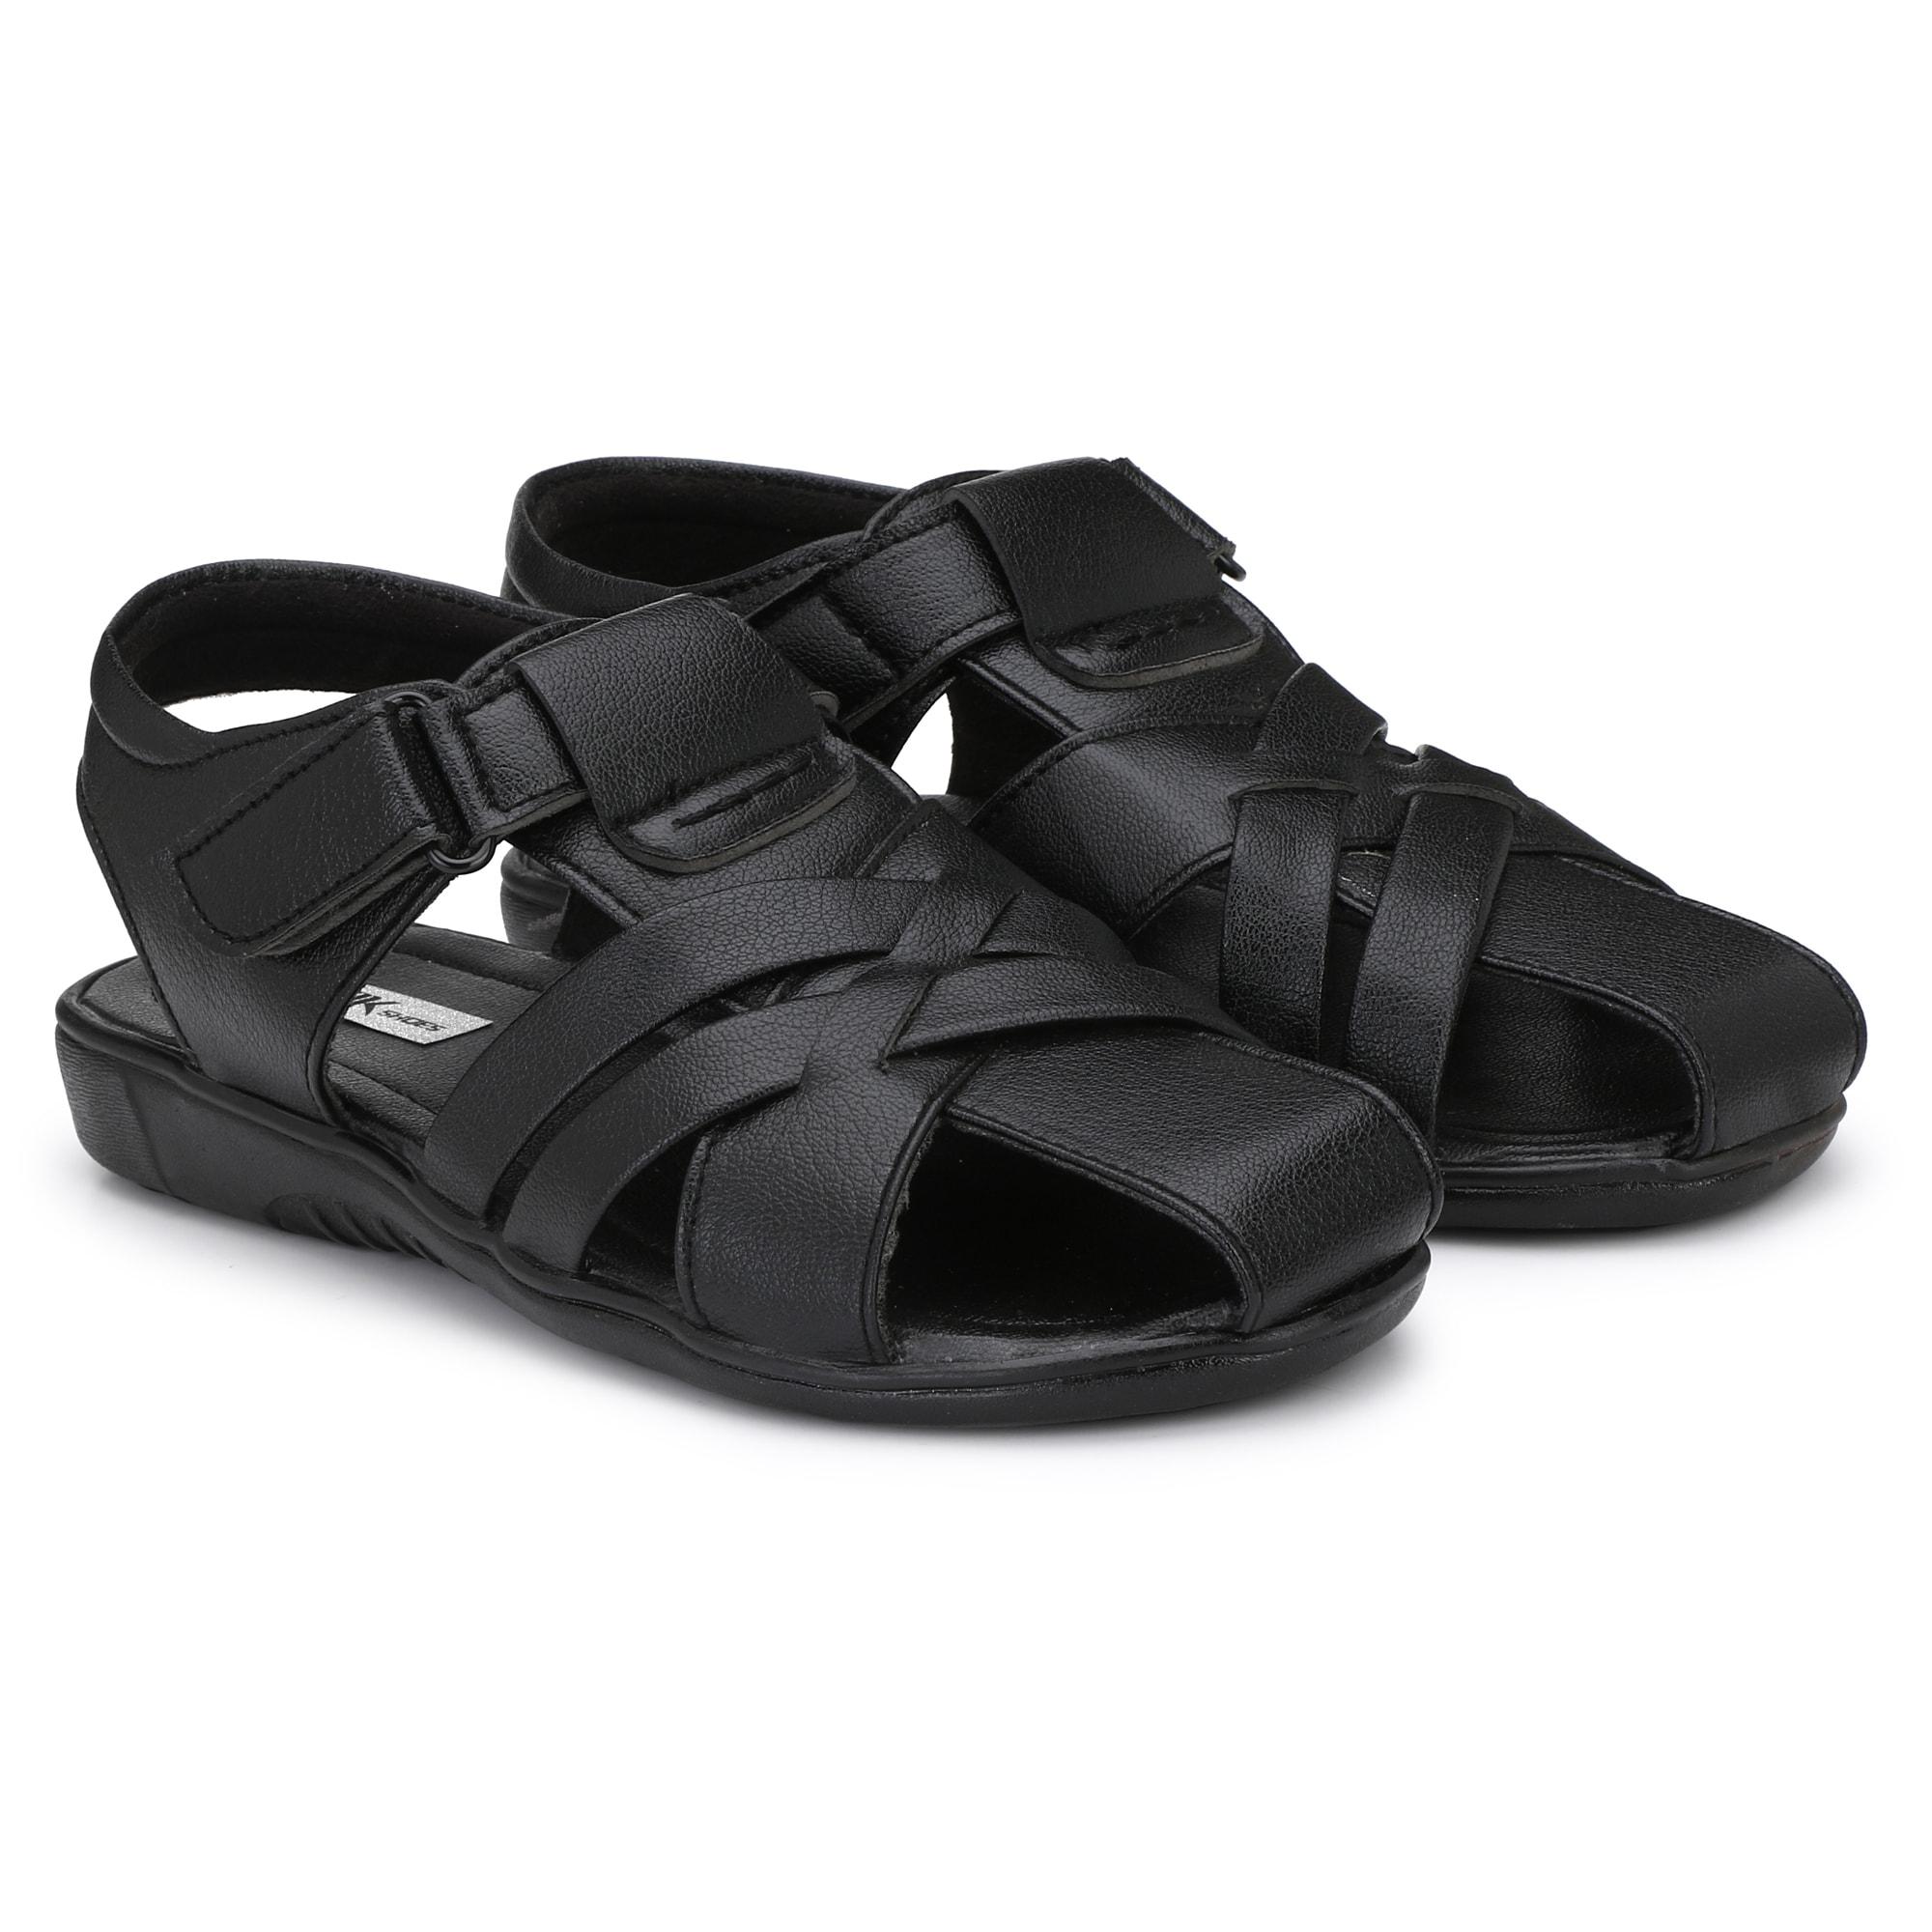 BUCIK Men's BLACK Synthetic Leather Casual Sandal BCK1021-BLACK (Black,6-10,8 PAIR)